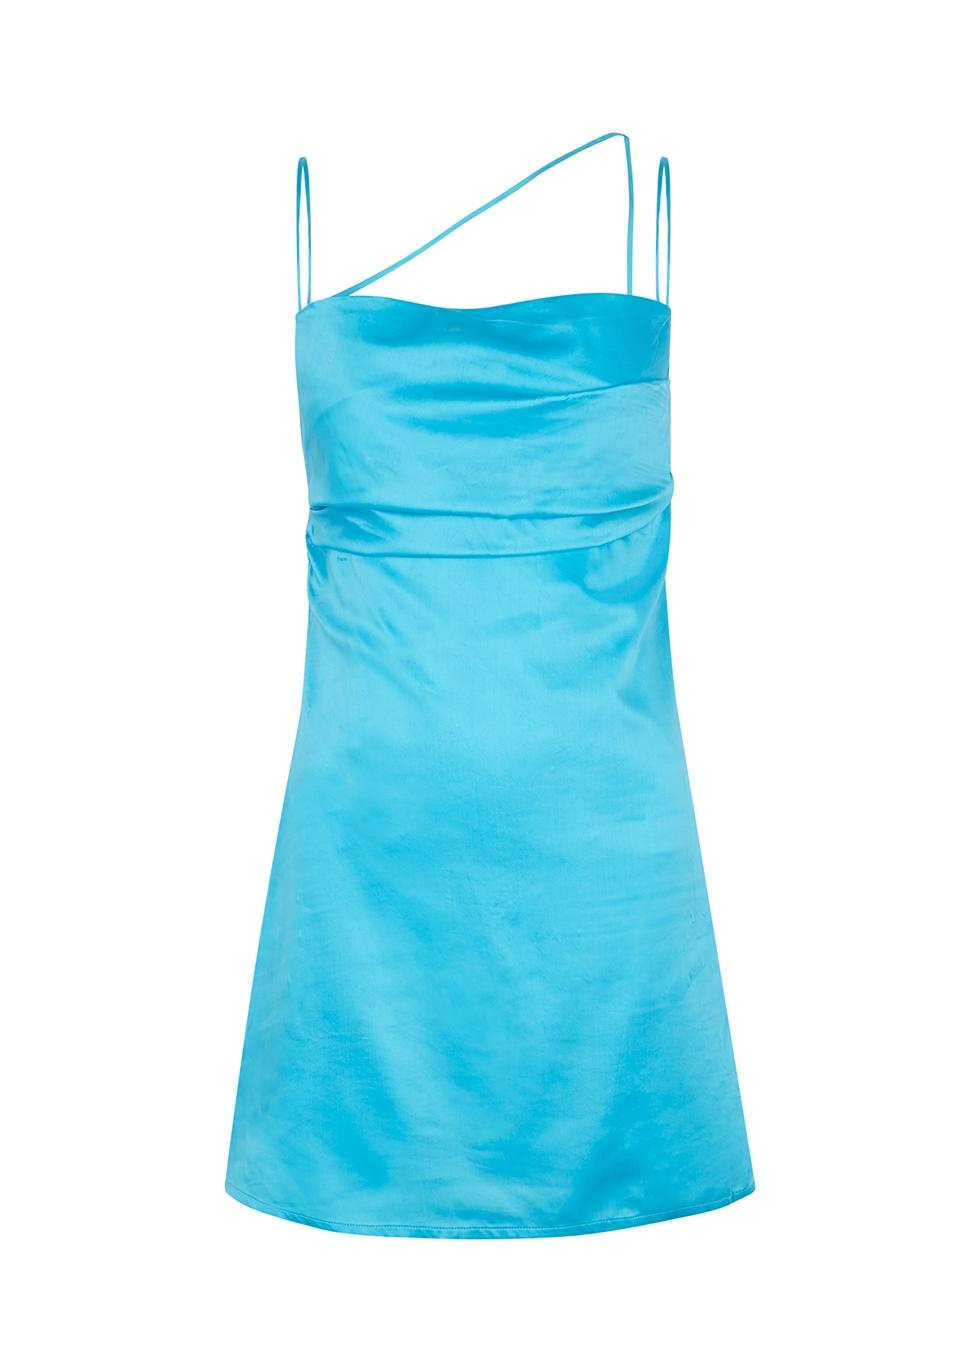 Frisco blue satin mini dress